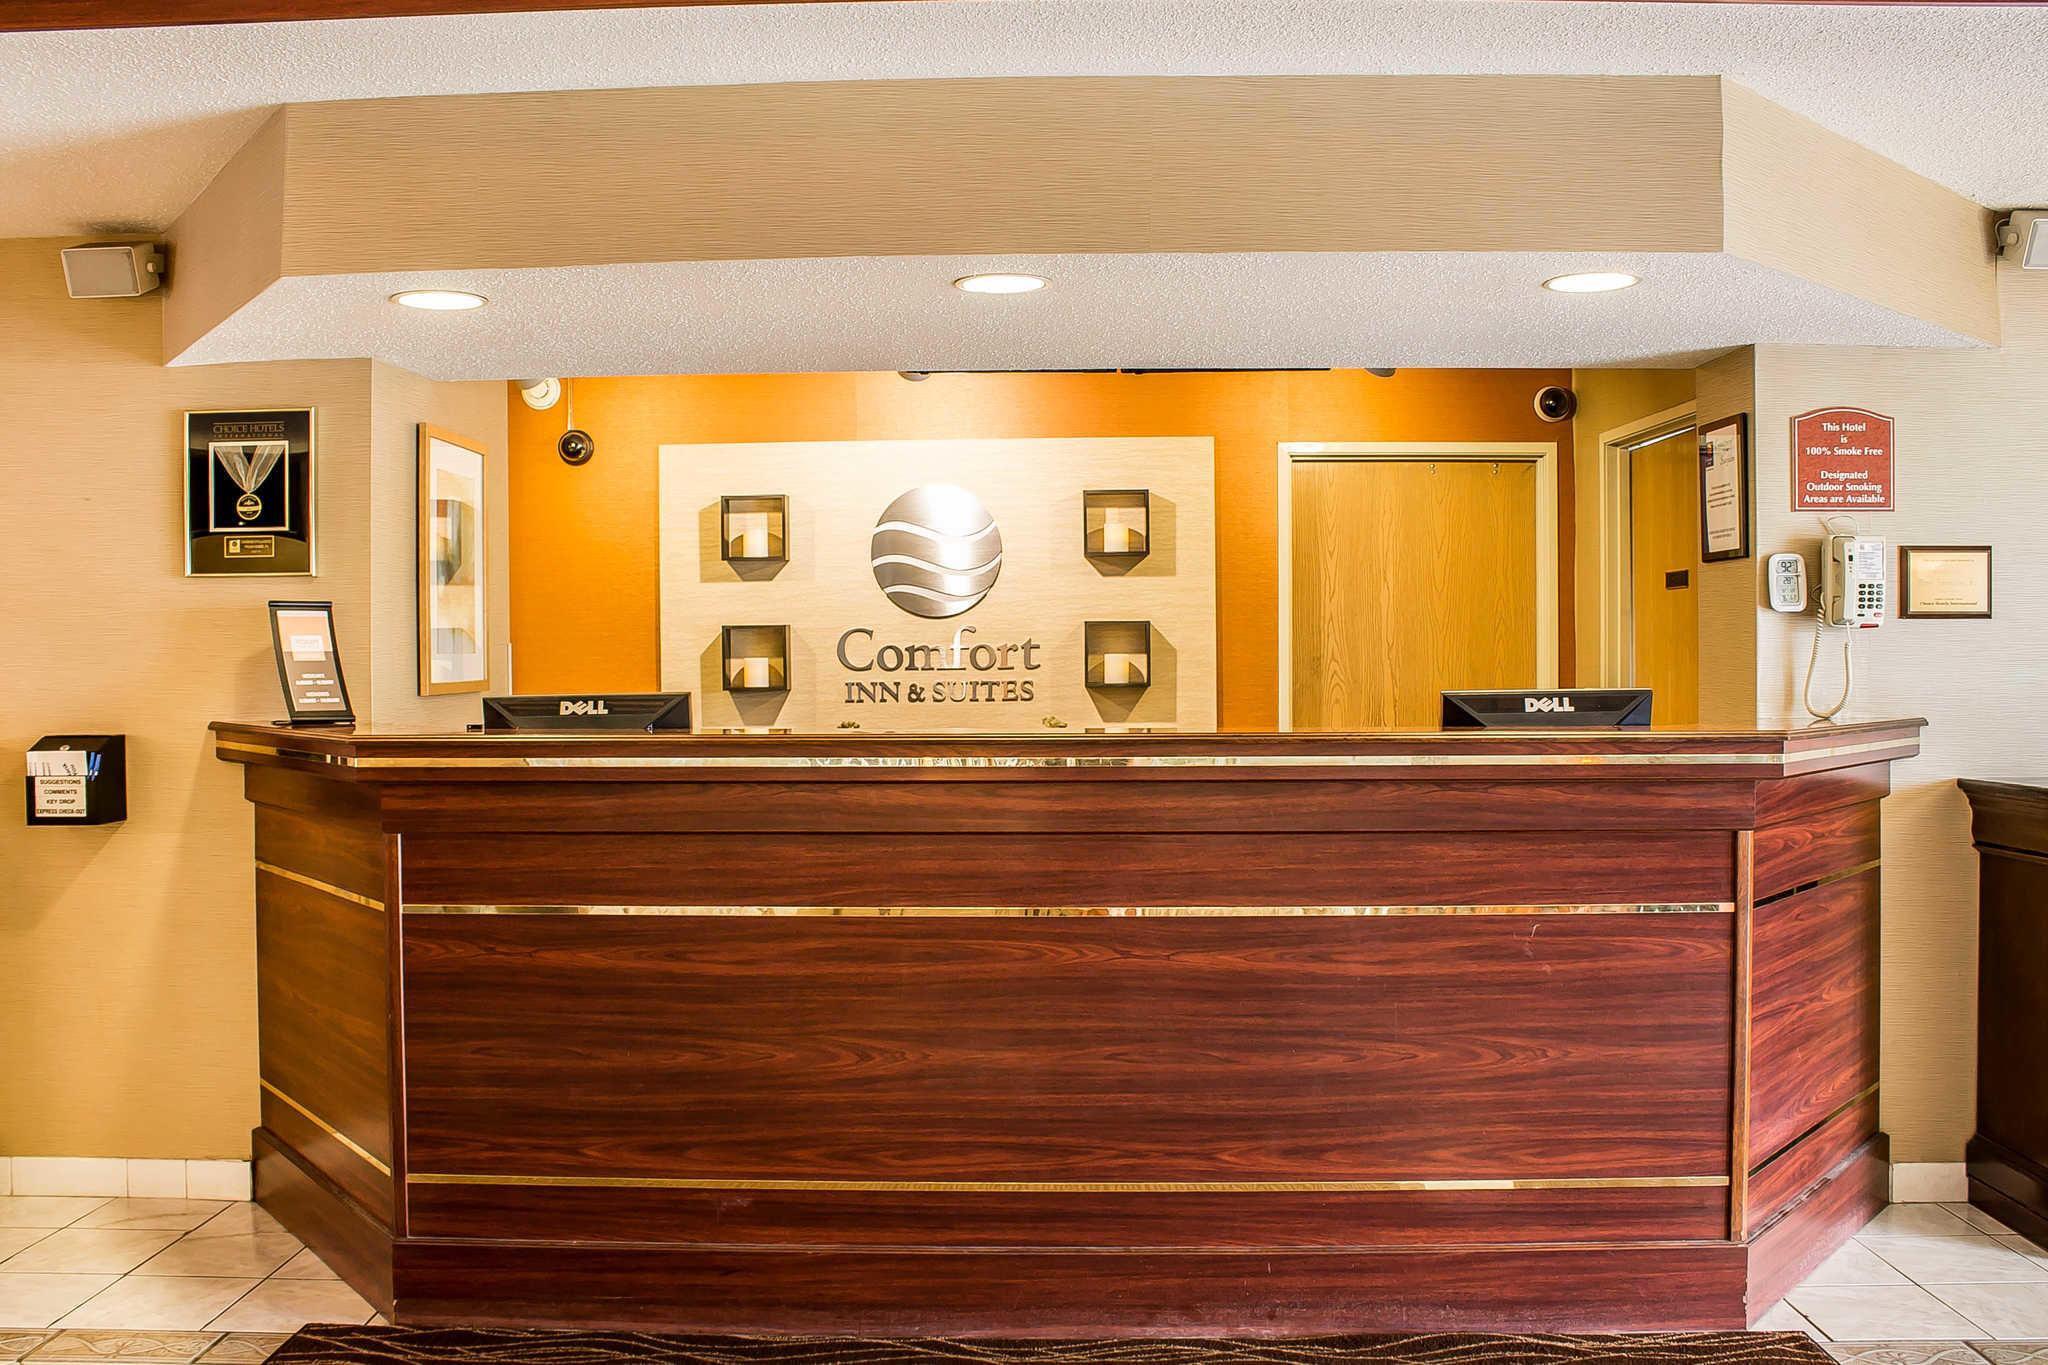 Comfort Inn & Suites image 4